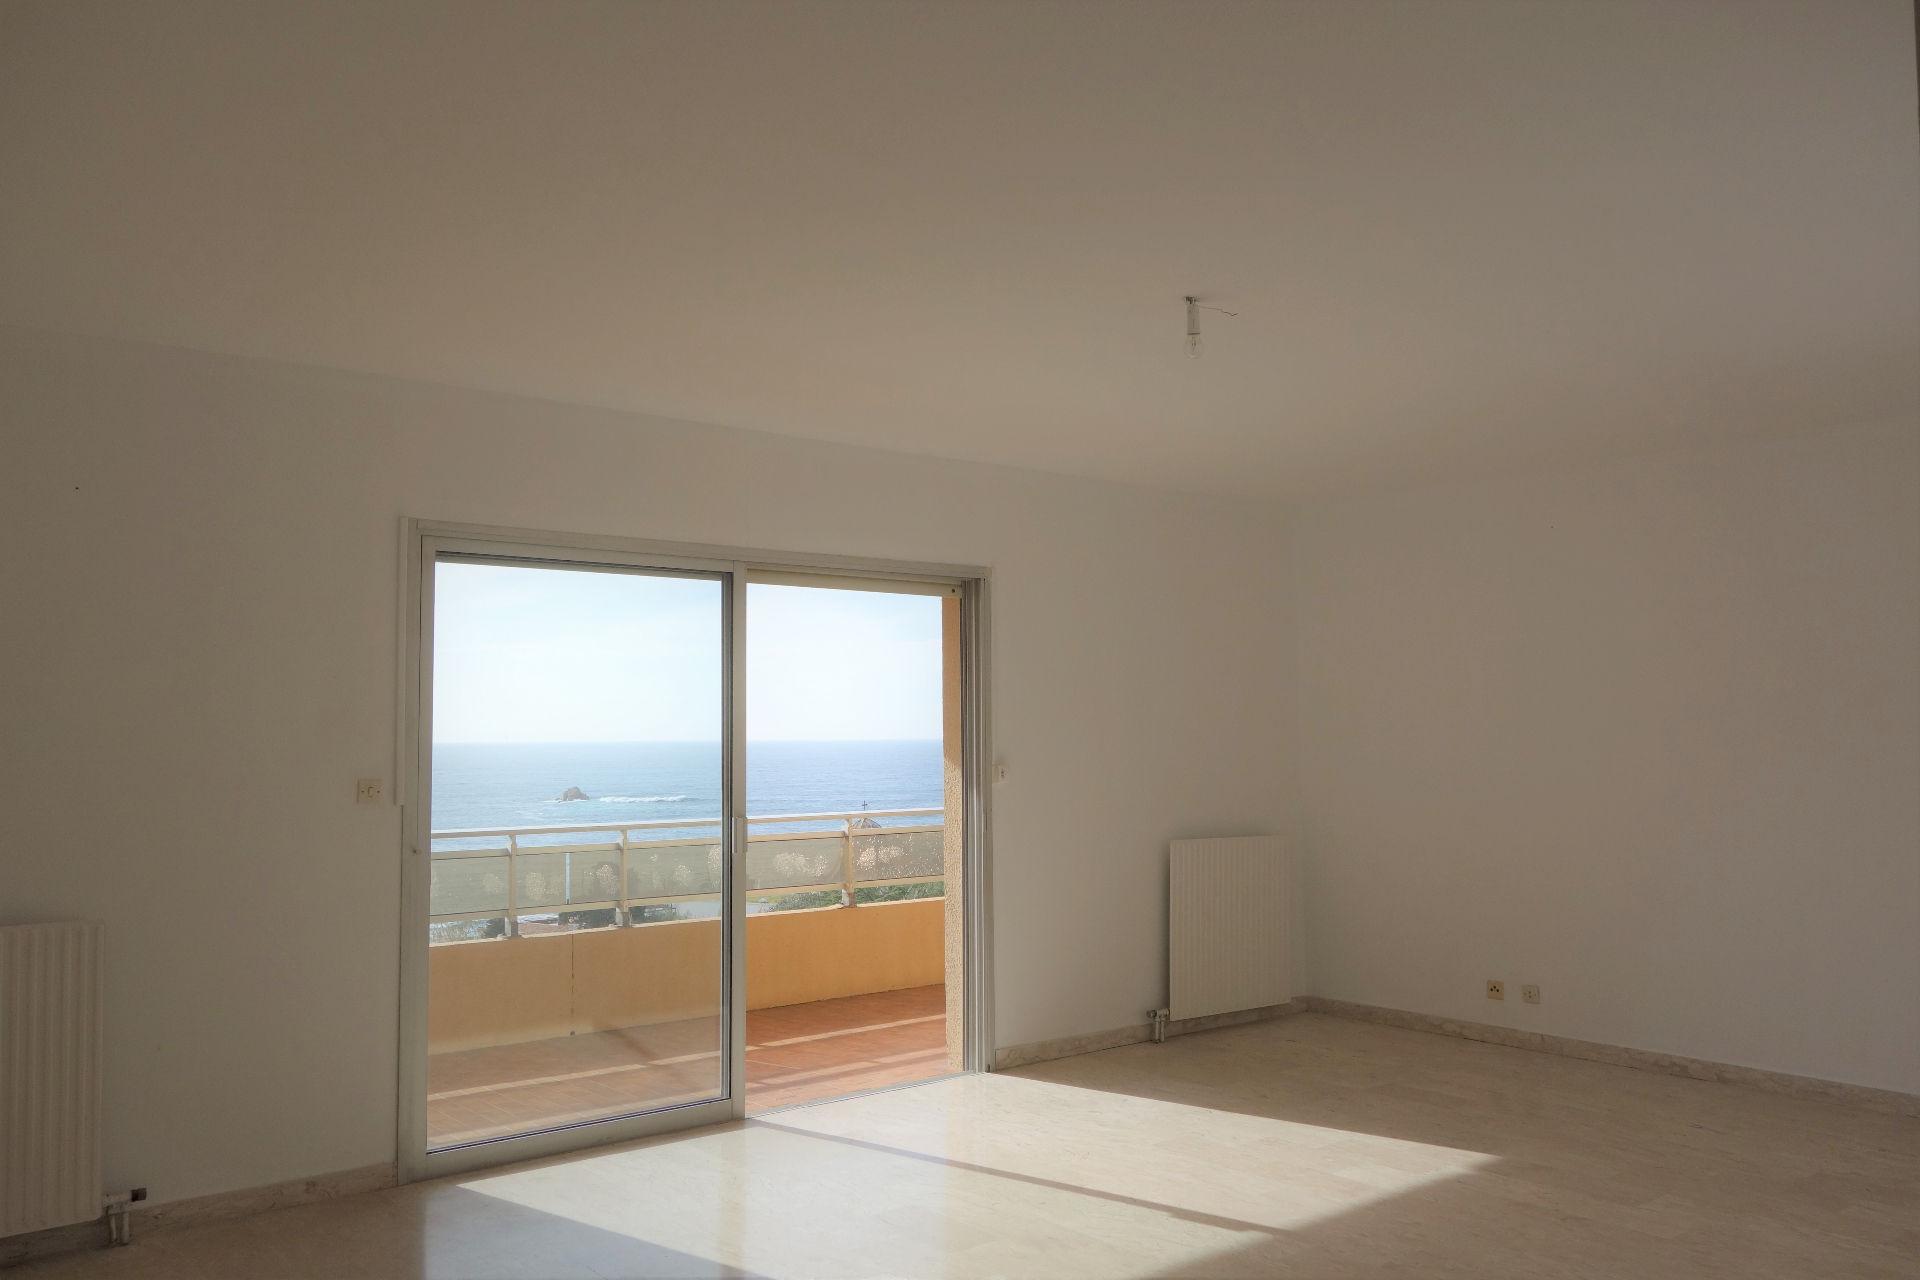 Photo Appartement Ajaccio 4 pièce(s) 100 m2 image 2/2